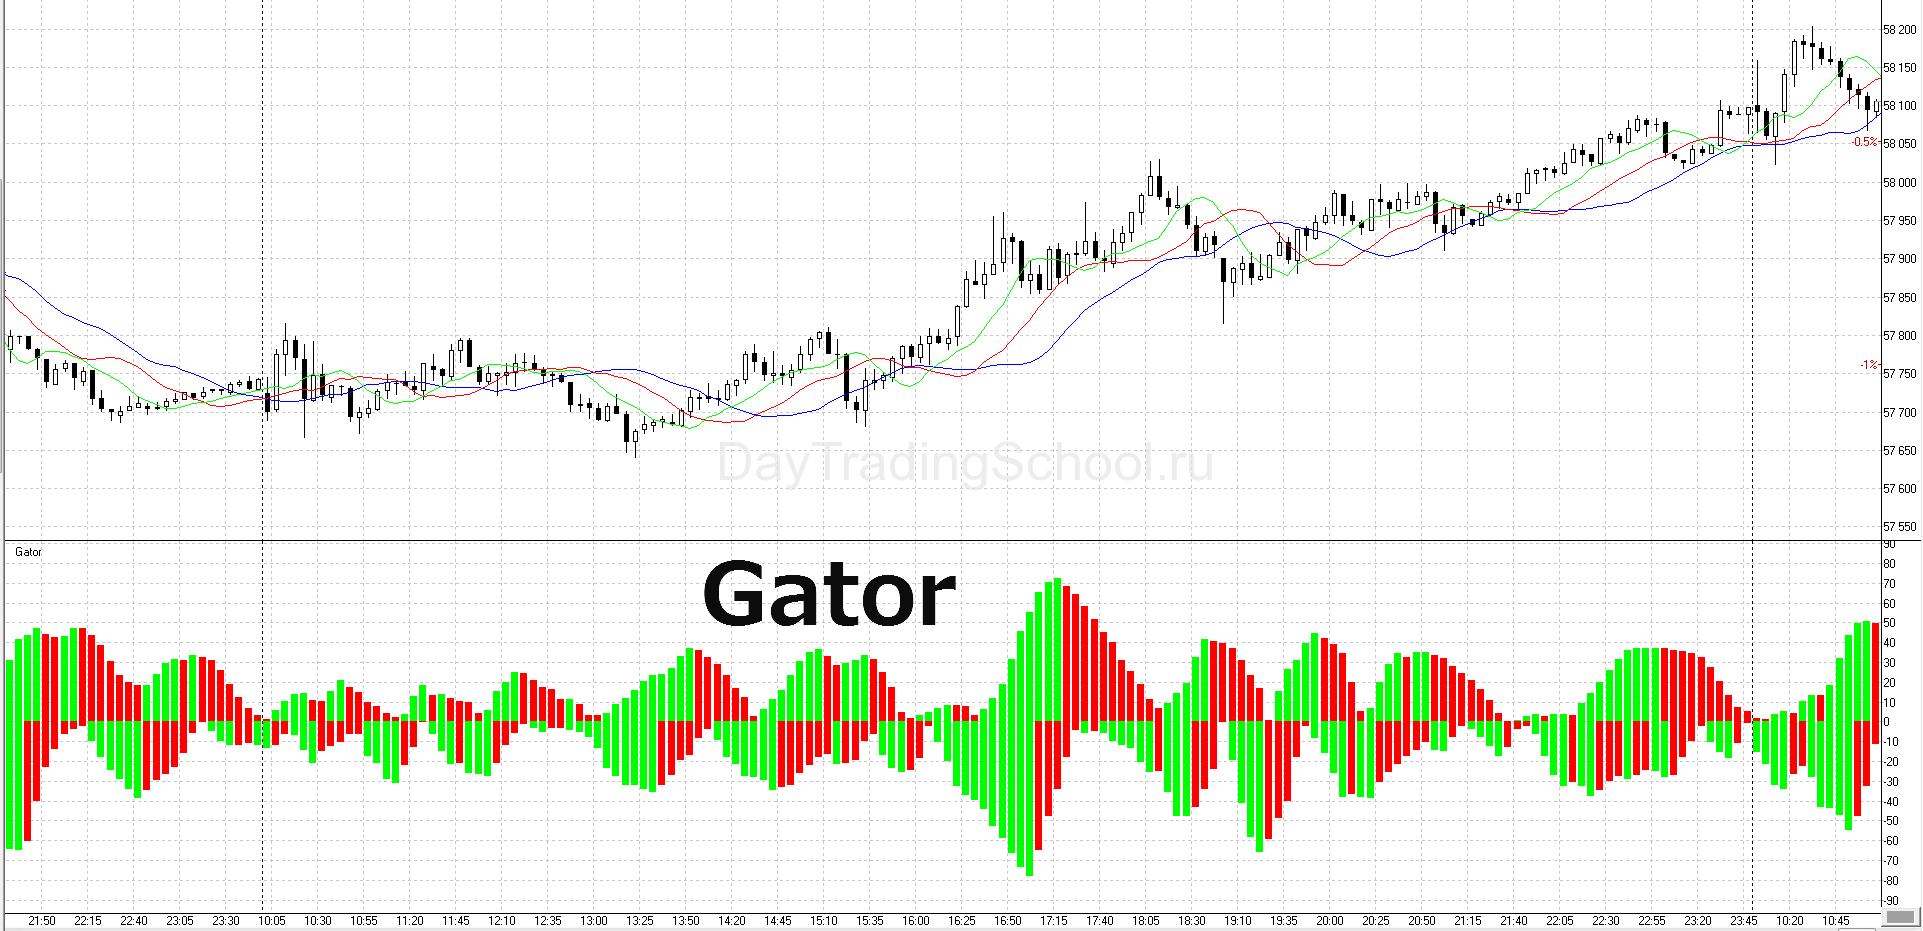 Gator-график